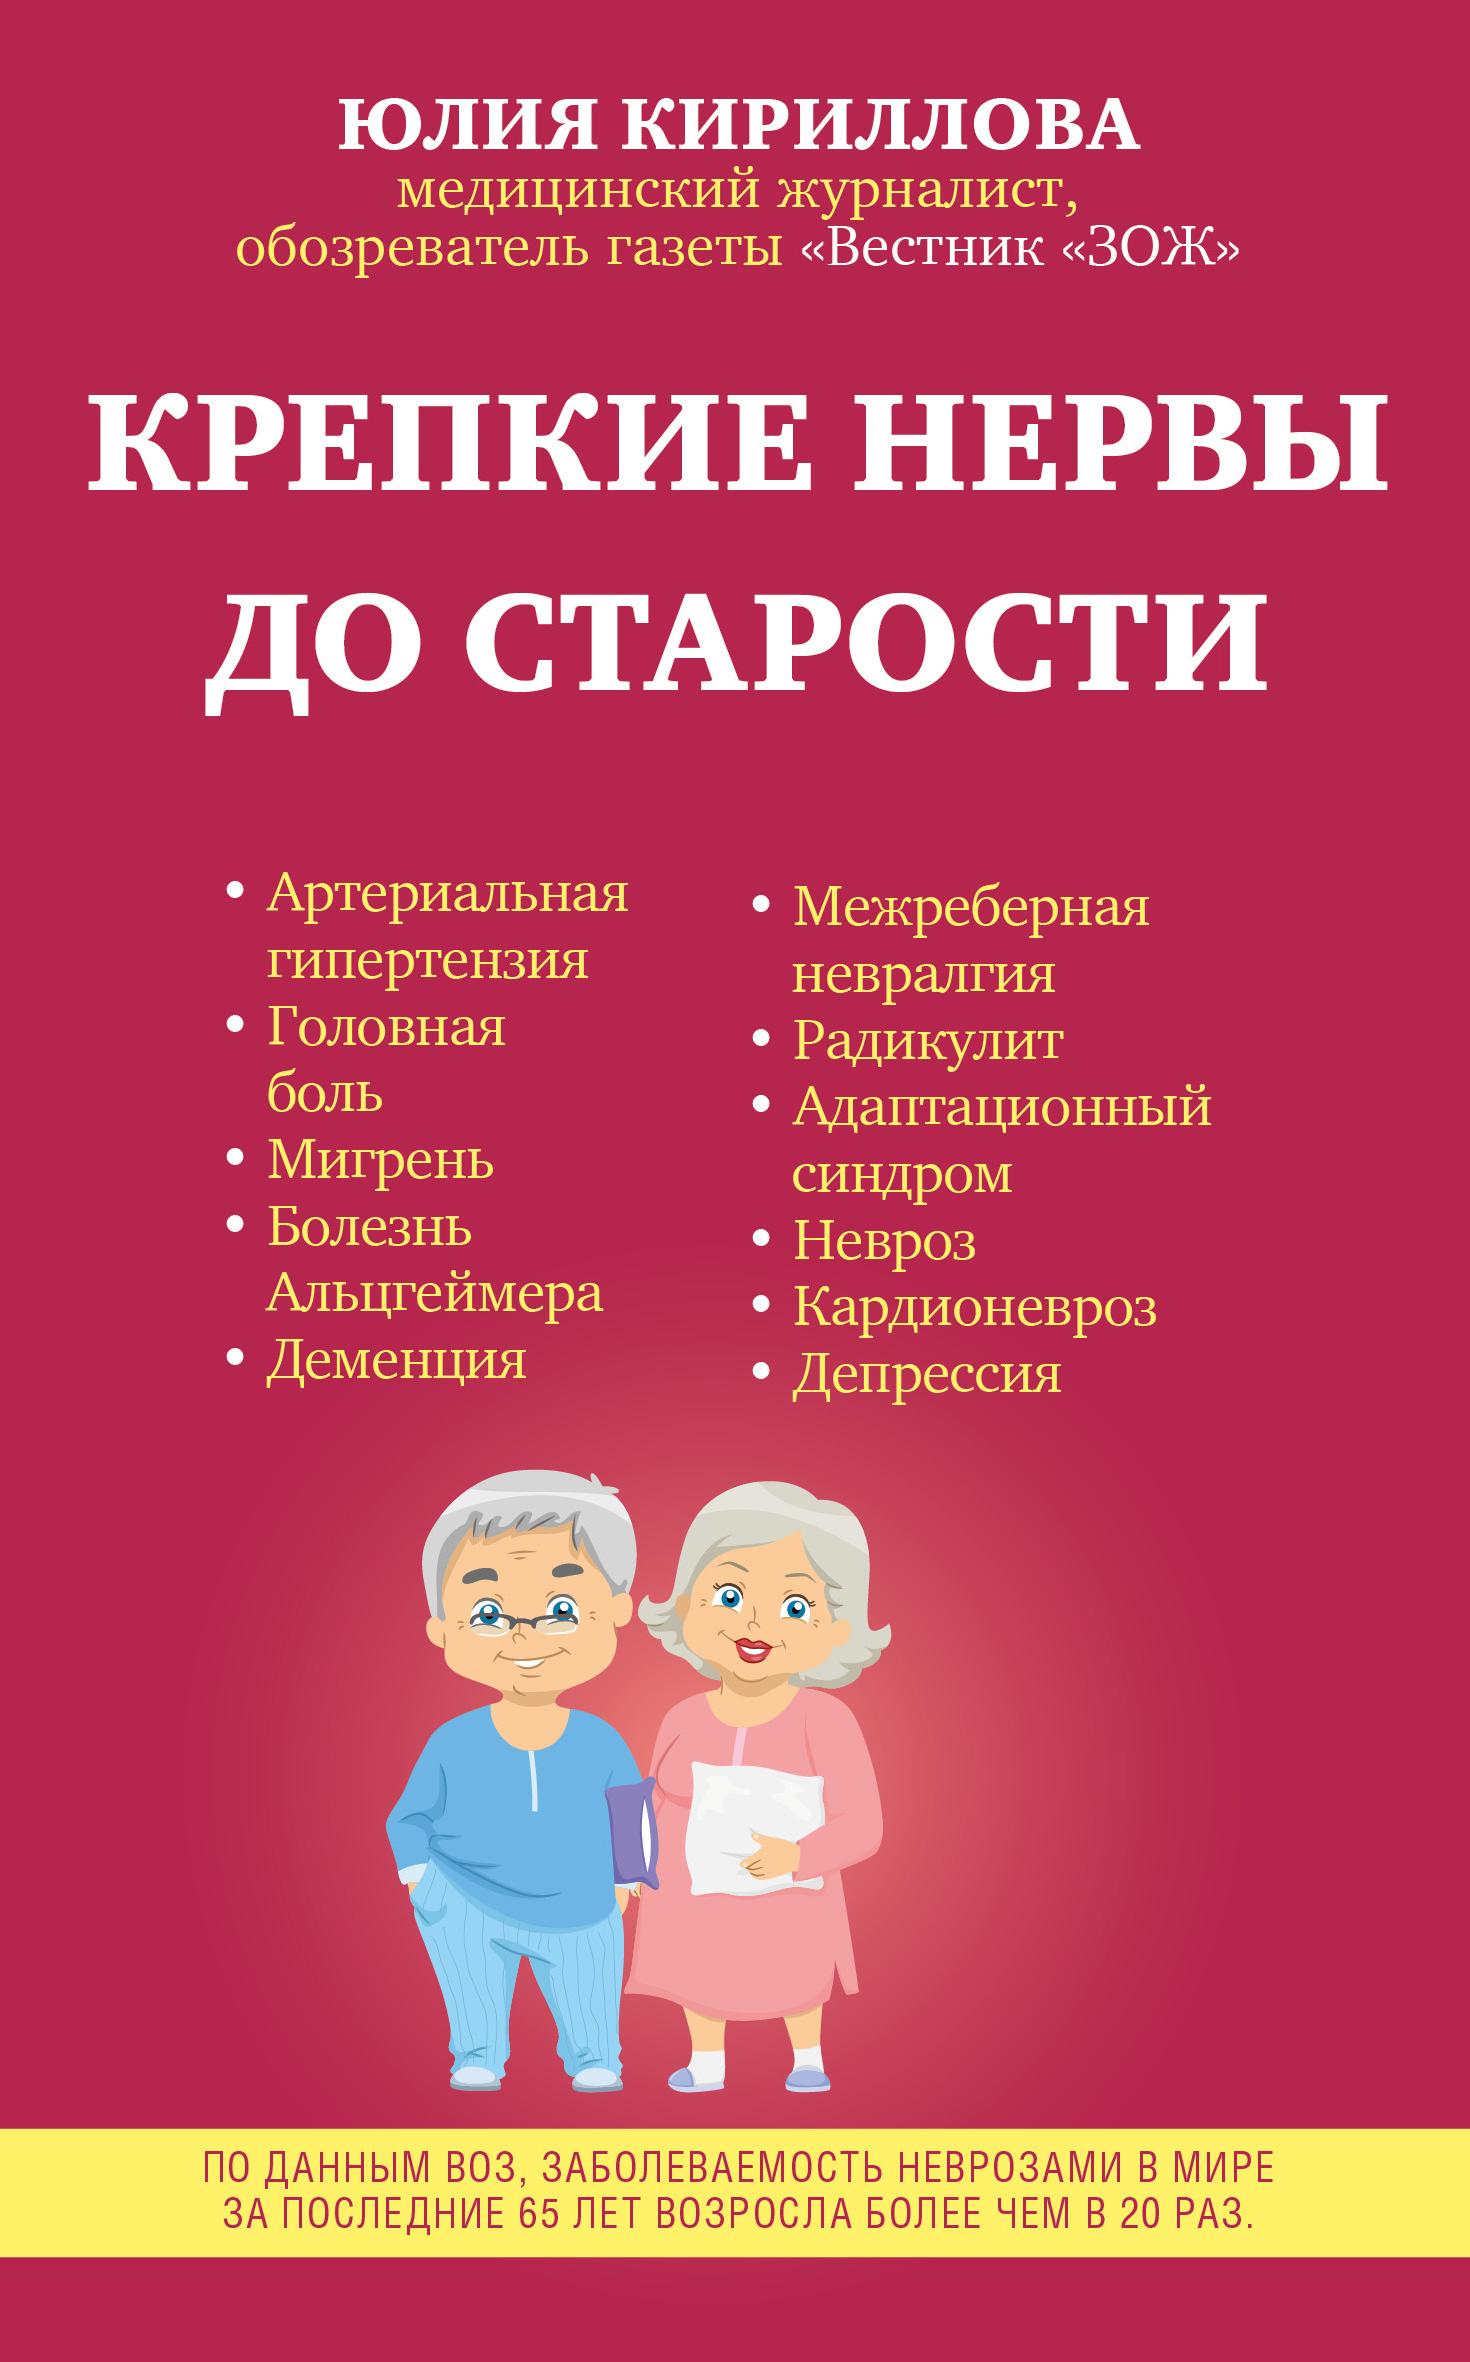 Юлия Кириллова Крепкие нервы до старости кириллова ю крепкие нервы до старости